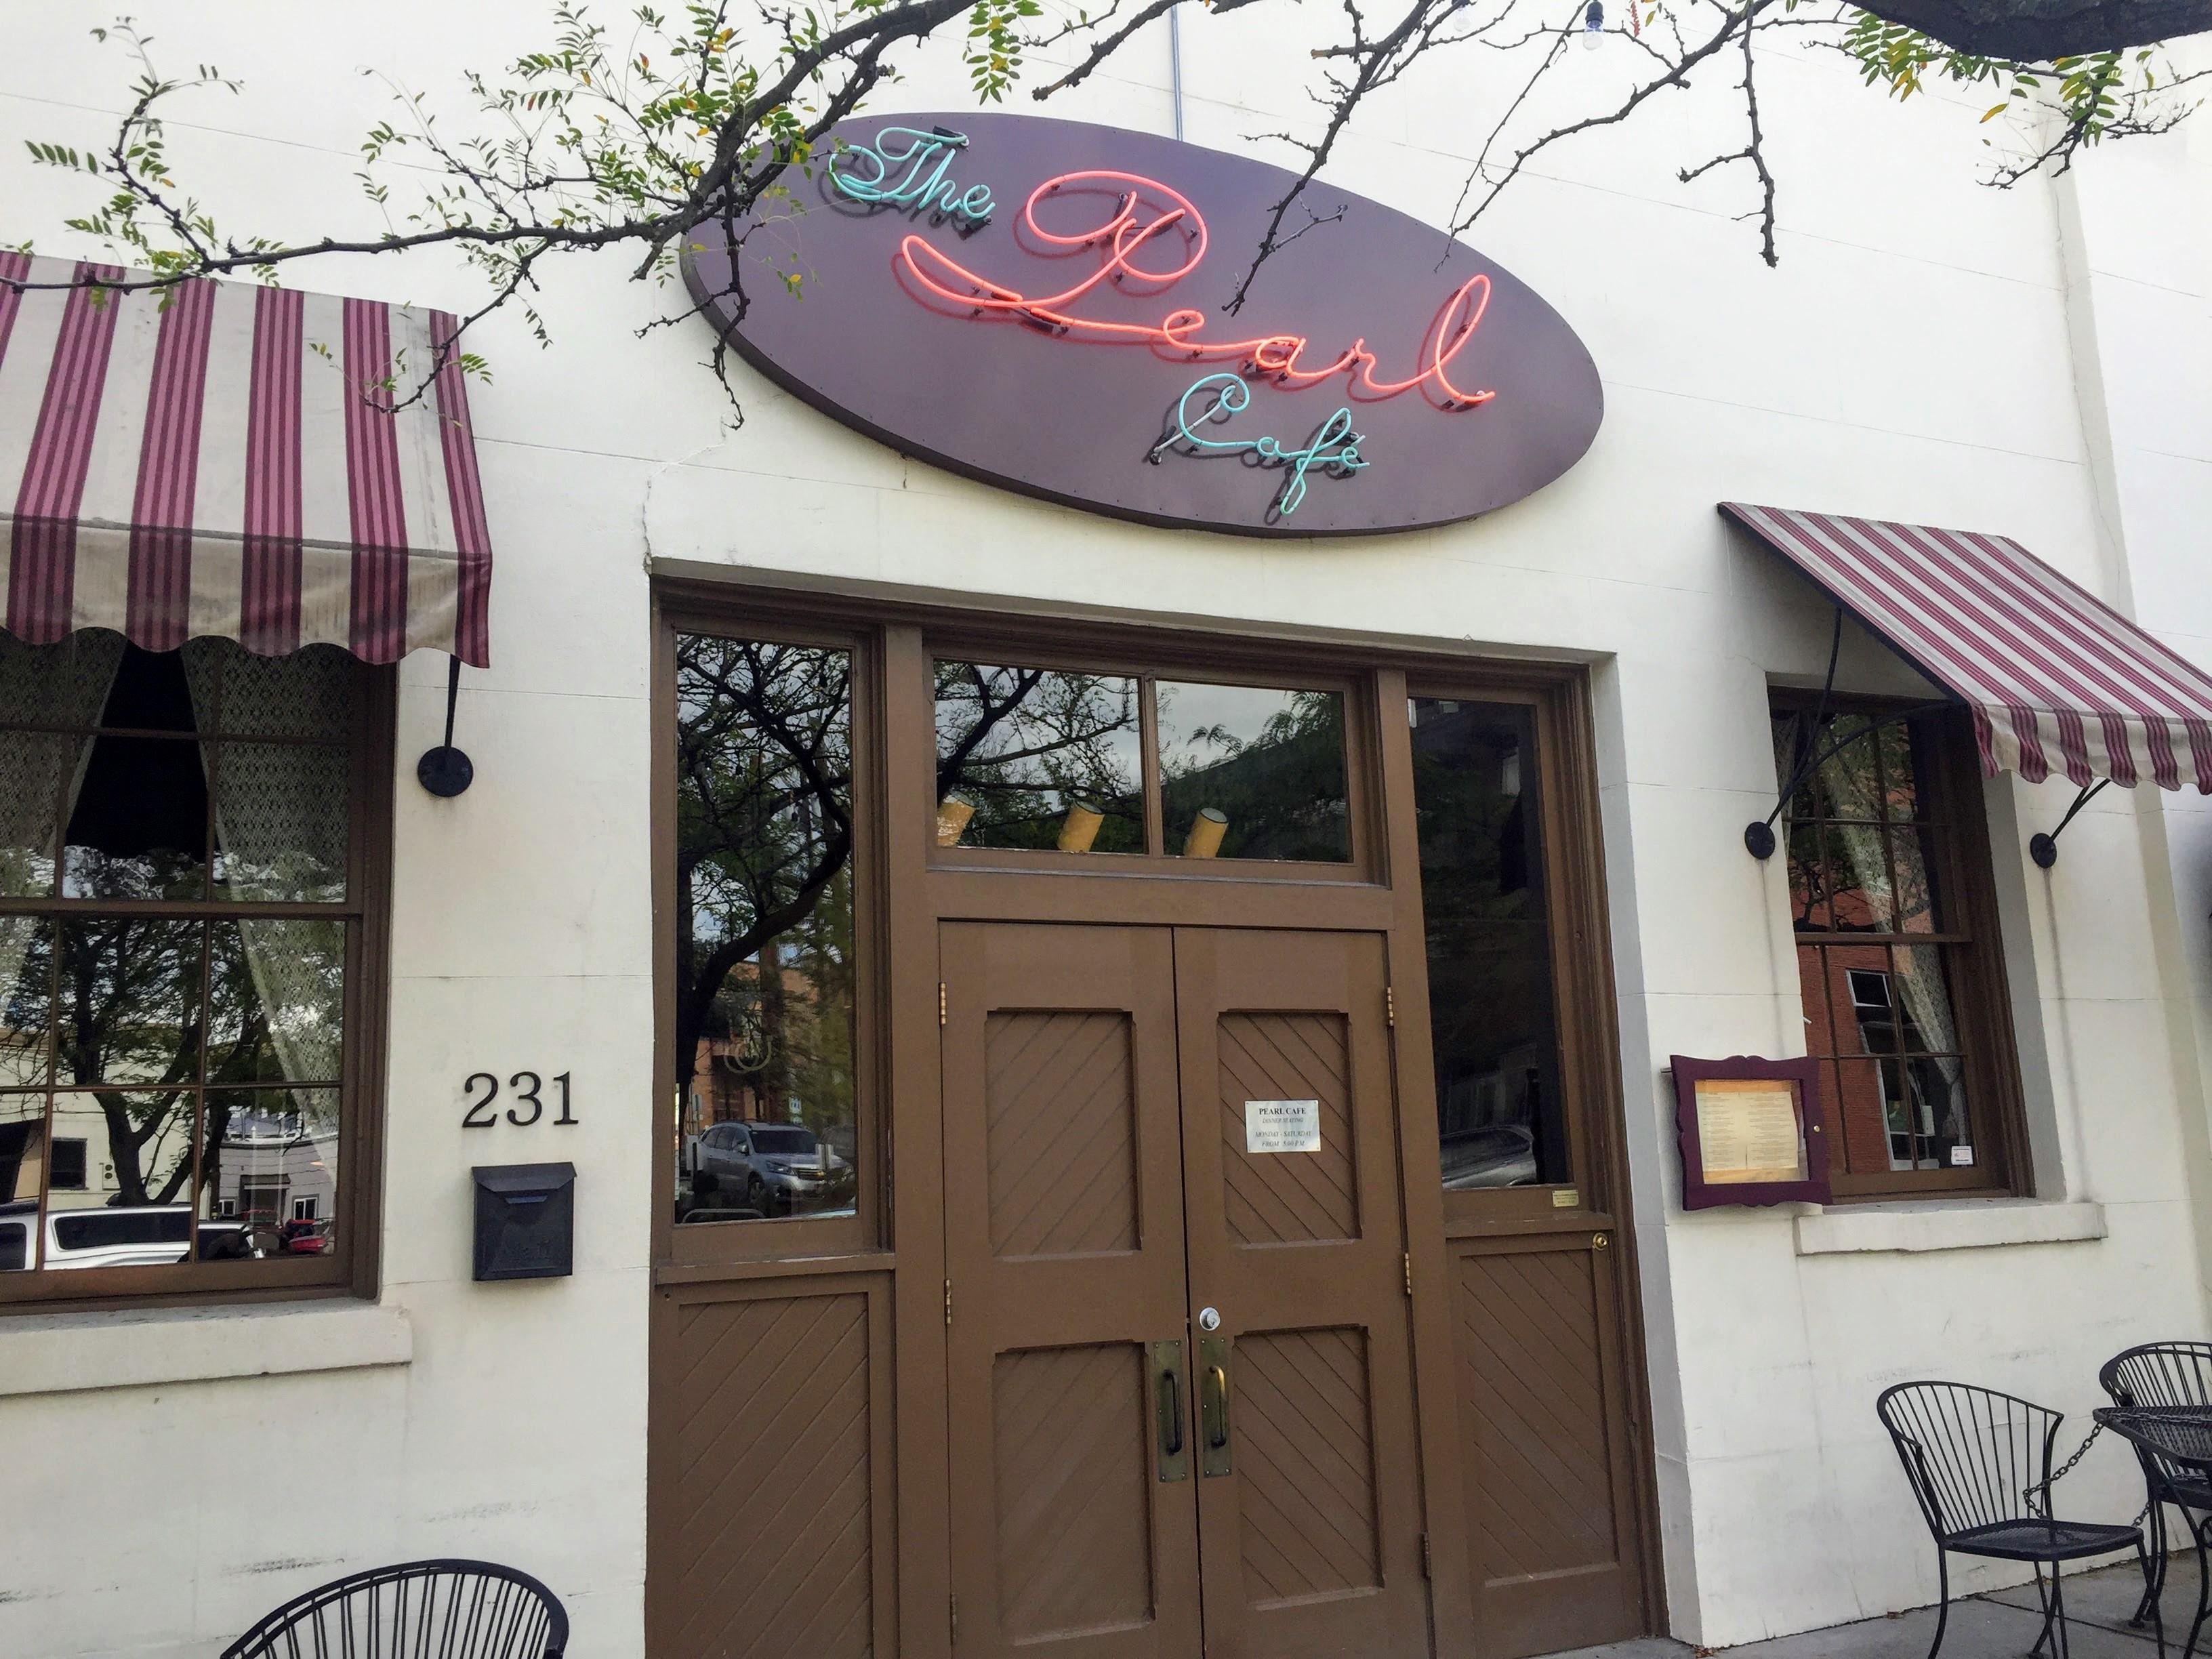 2017-09-20 01 Montana 10 The Pearl Cafe